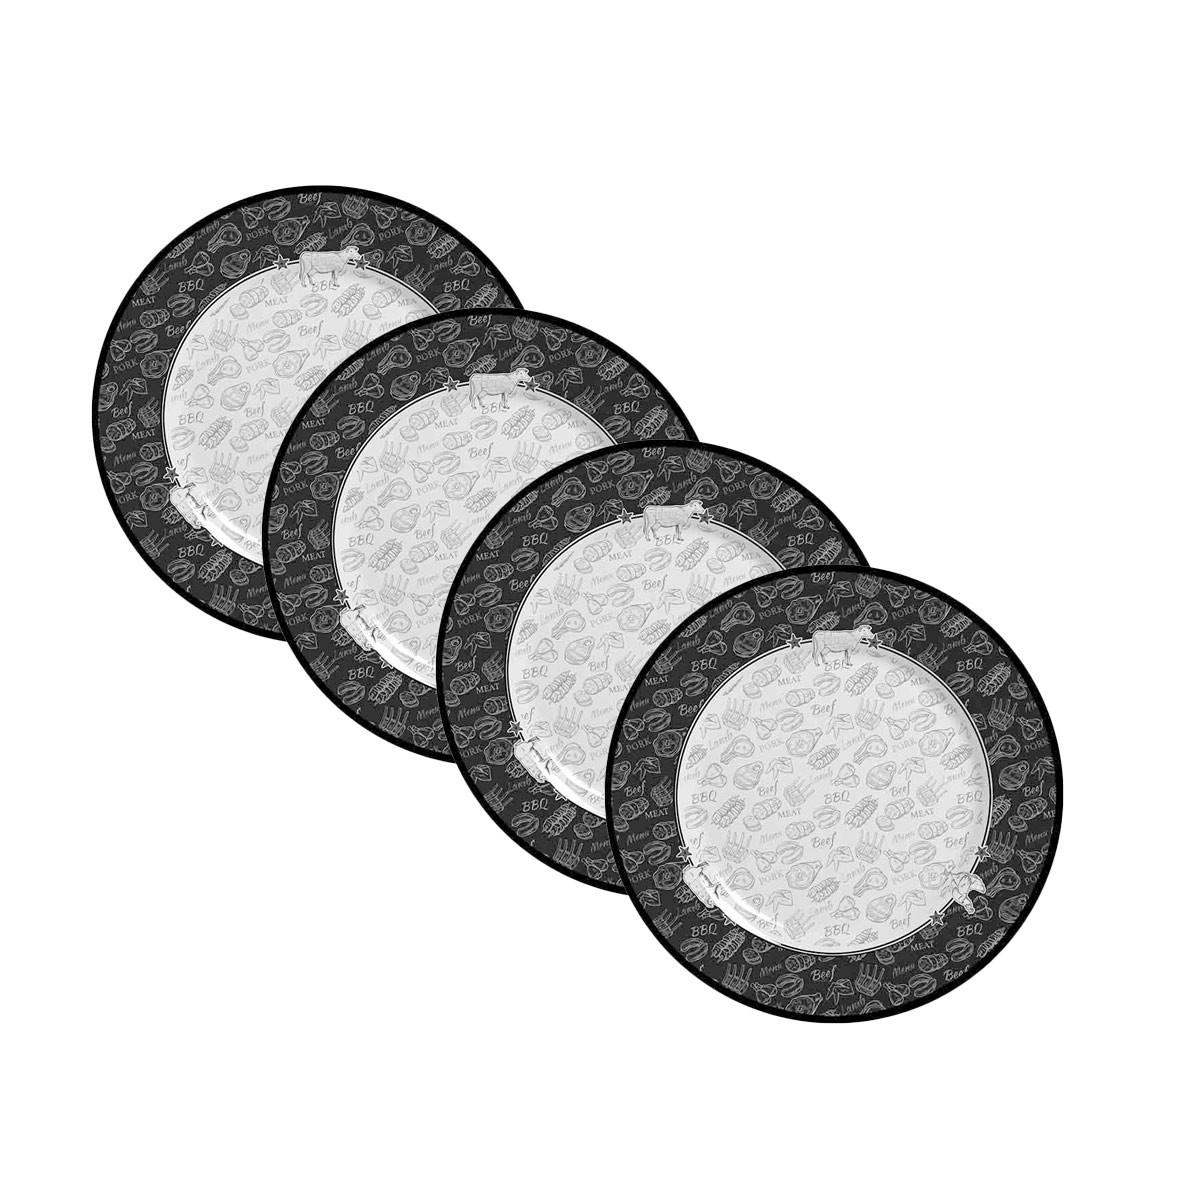 Jogo de 4 Pratos de Sobremesa Alleanza Barbecue 2ª Linha  - Lemis